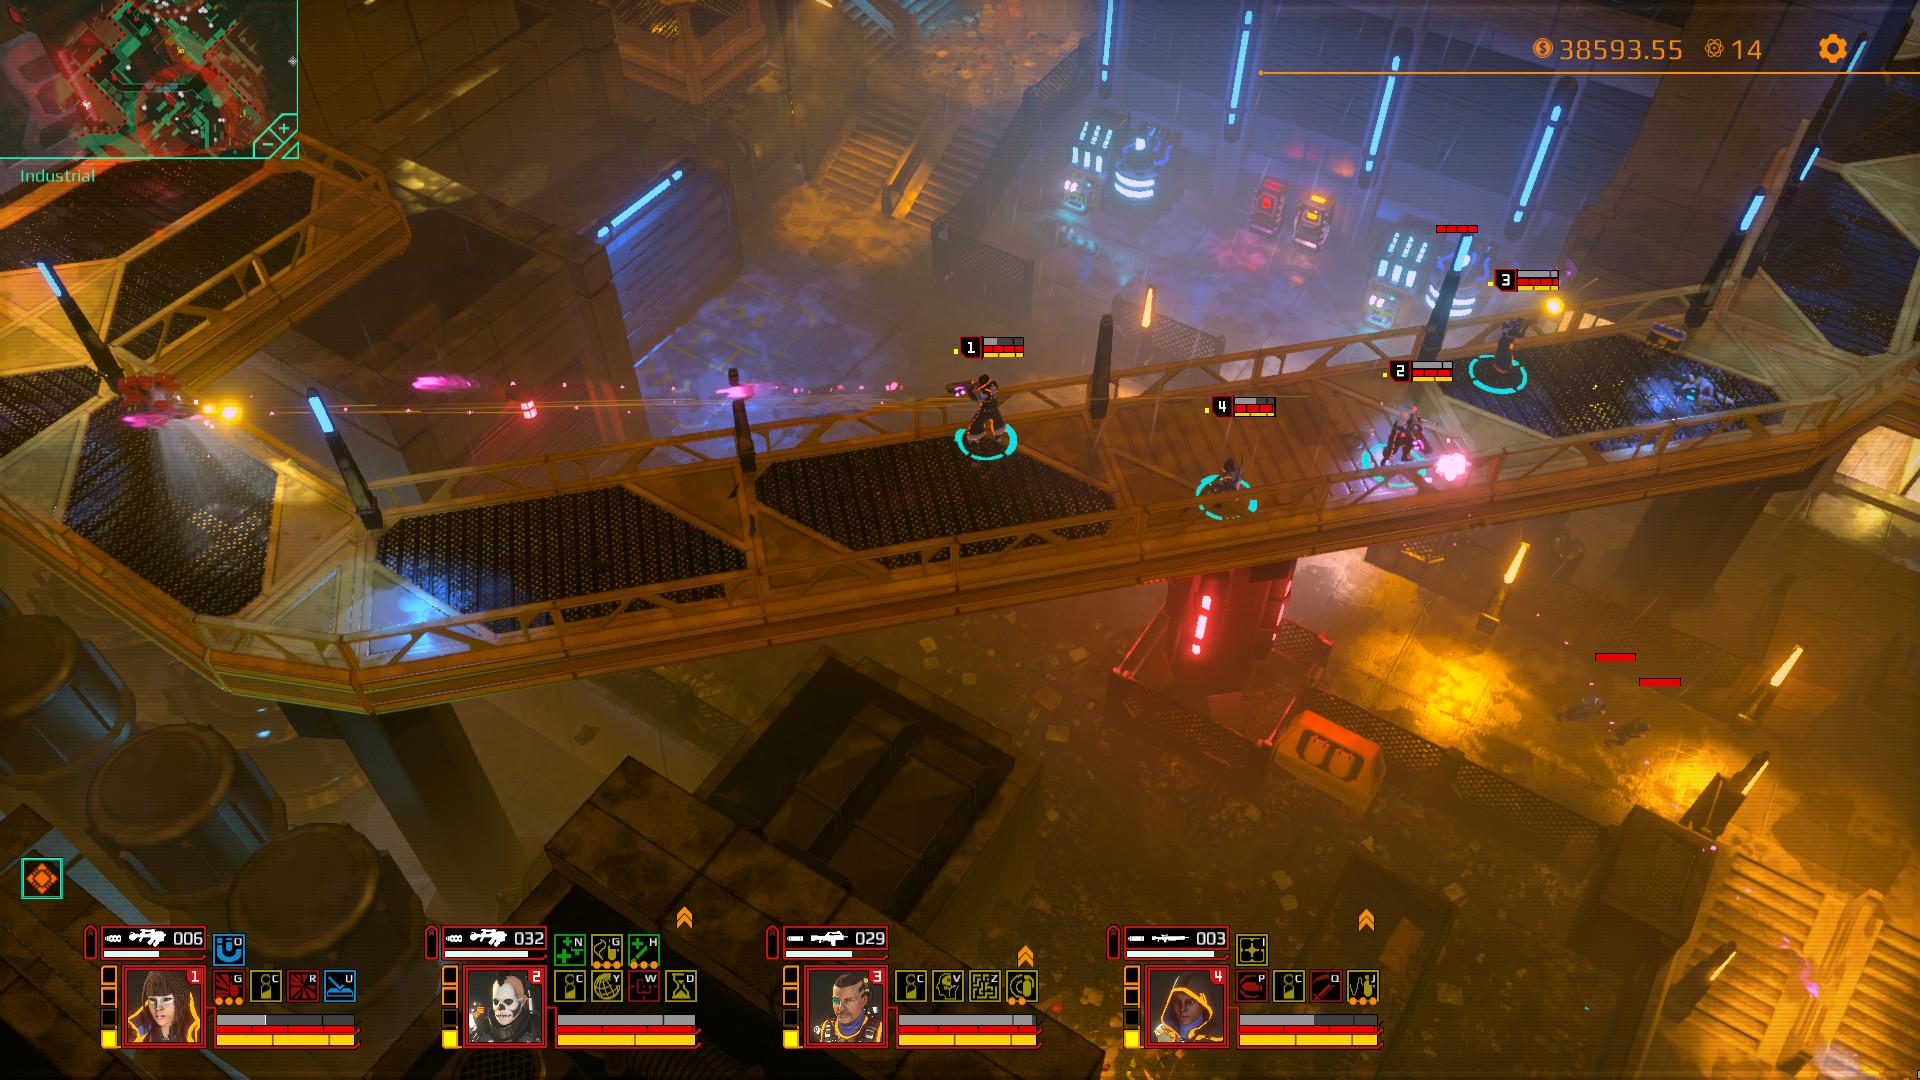 Satellite Reign MULTi7-PLAZA - Skidrow Games - Crack - Full Version Pc Games Download Free